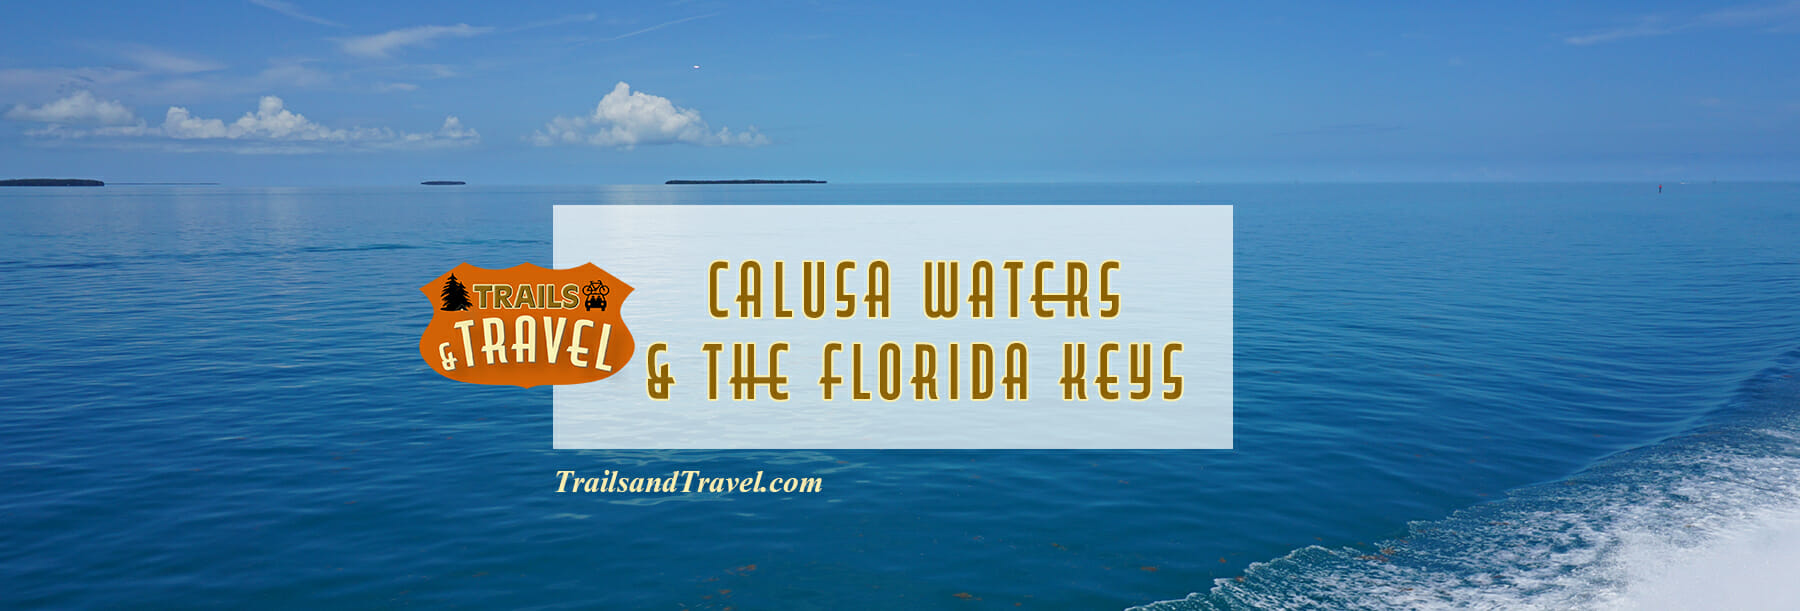 Calusa Waters and the Florida Keys